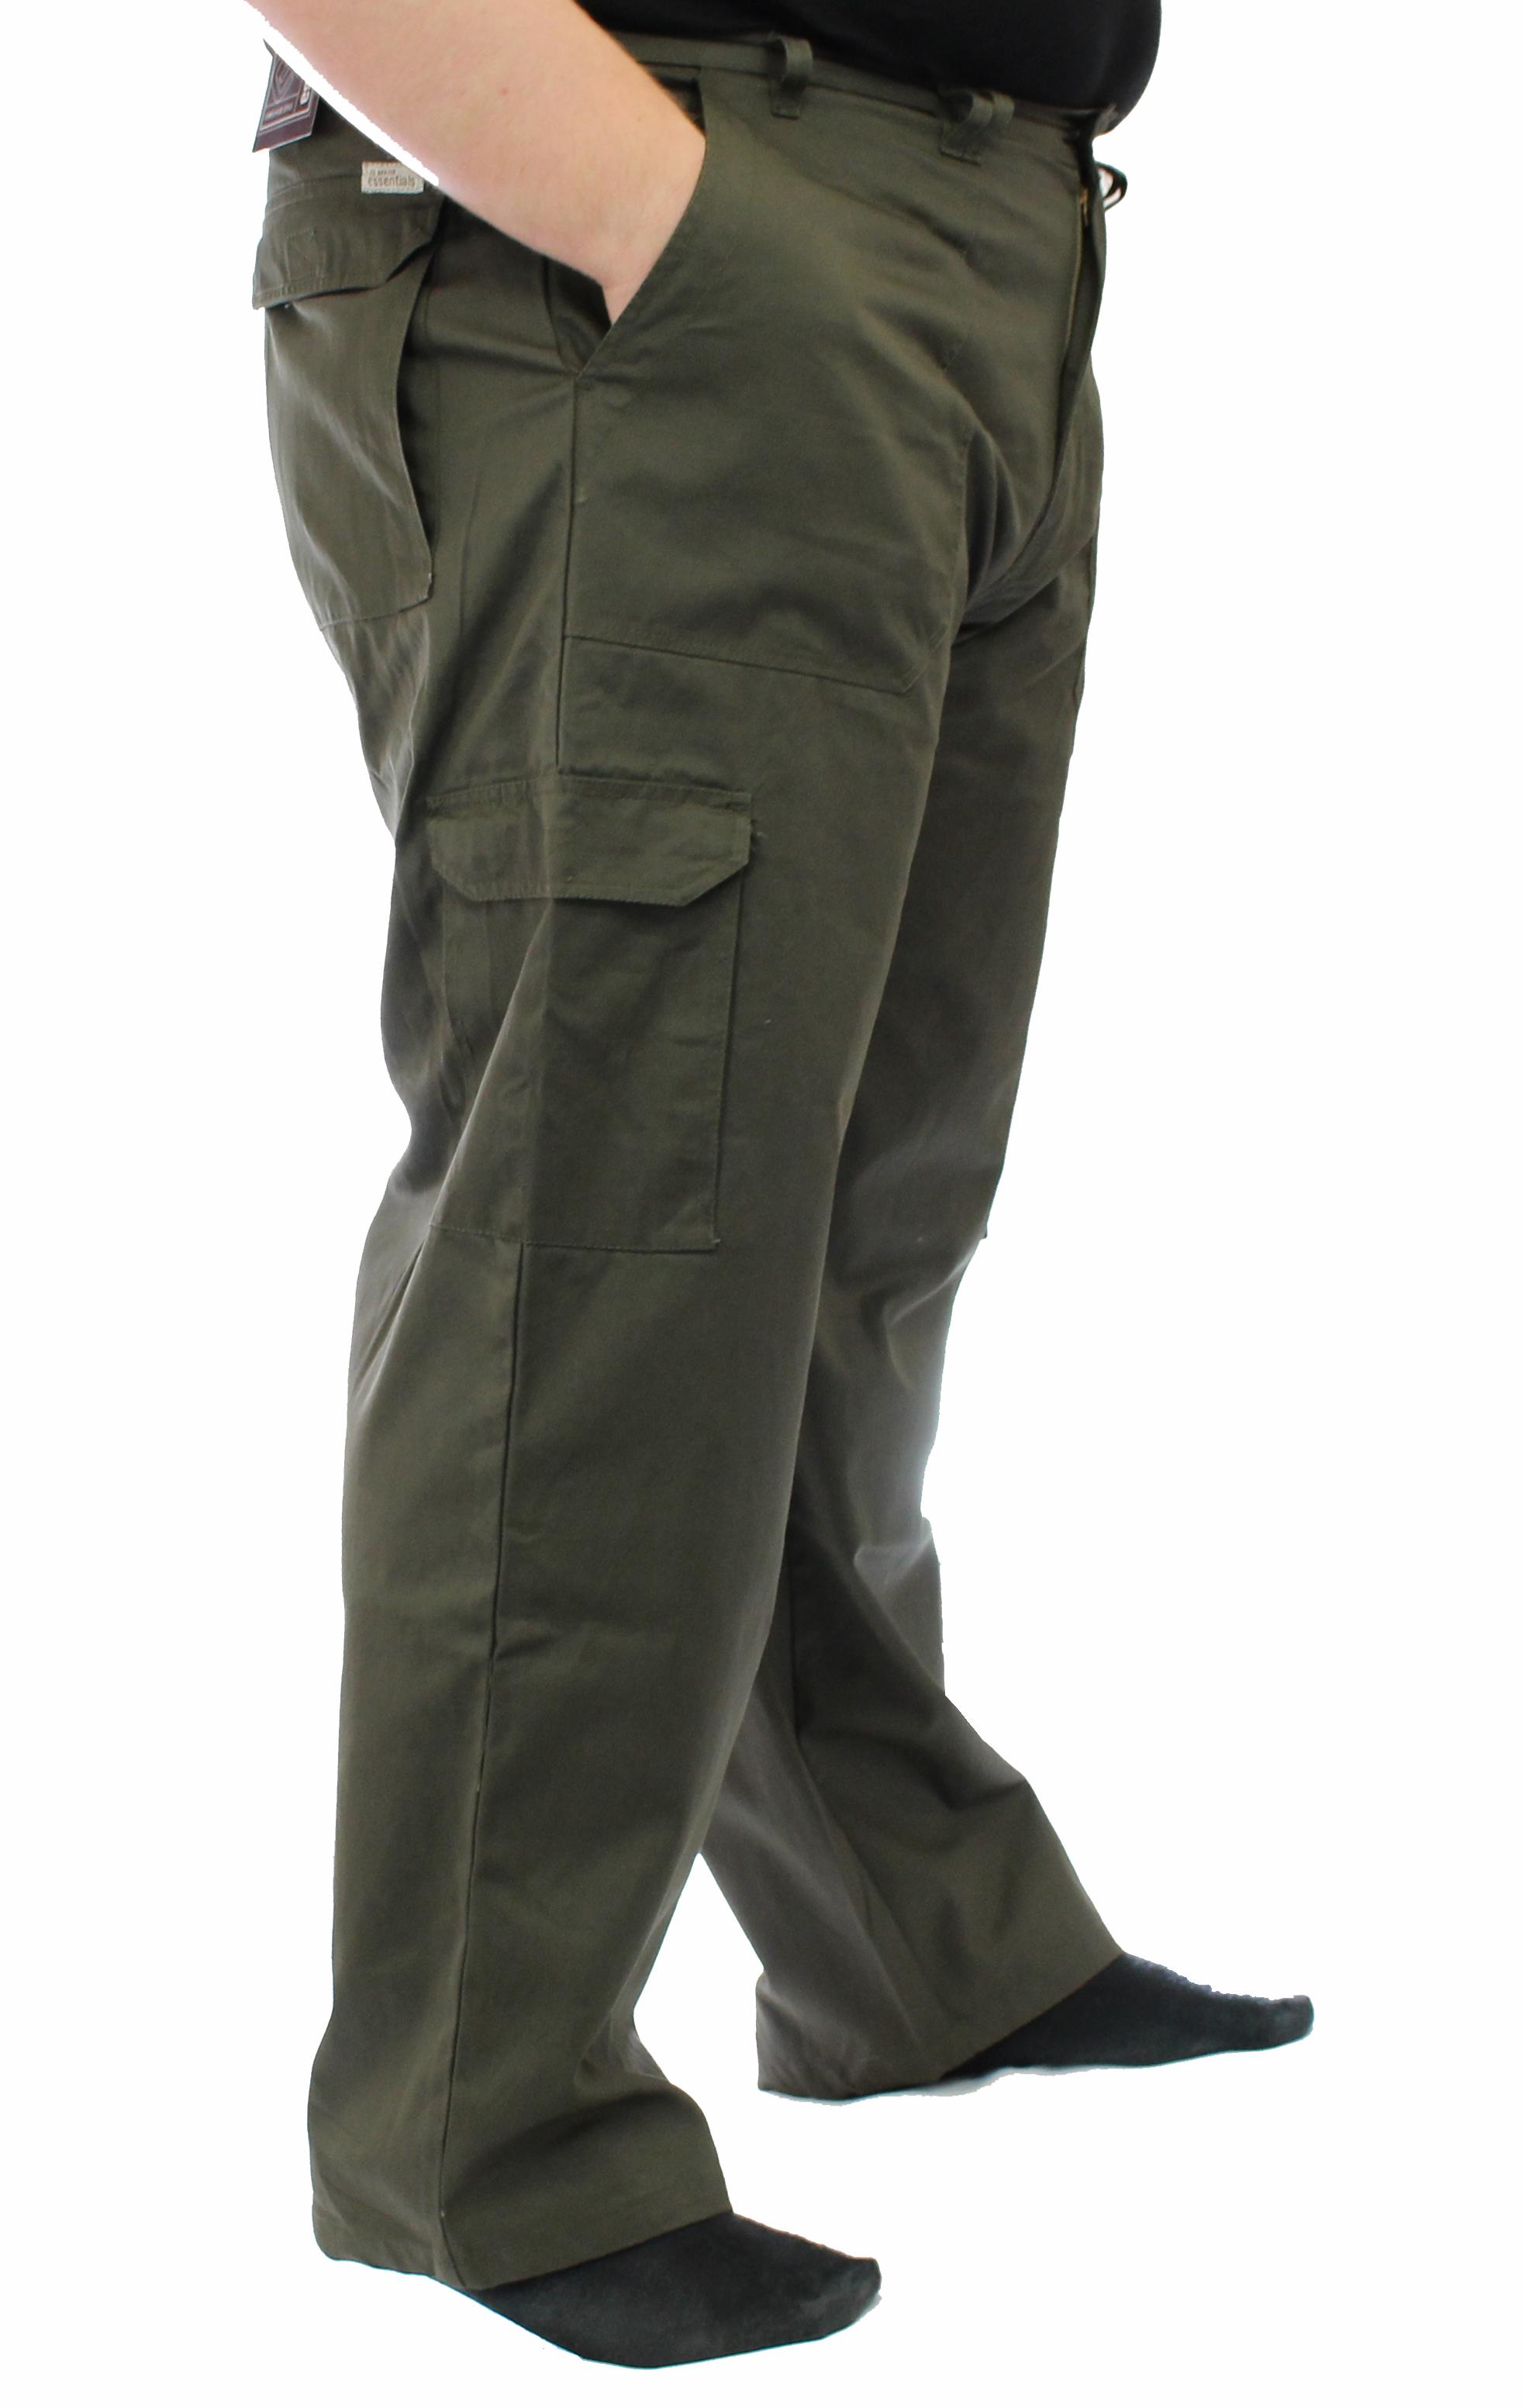 "Ed Baxter Victory - Heavy Duty Cargo Combat Trousers - Khaki - 56"" Waist, 30"" Leg"